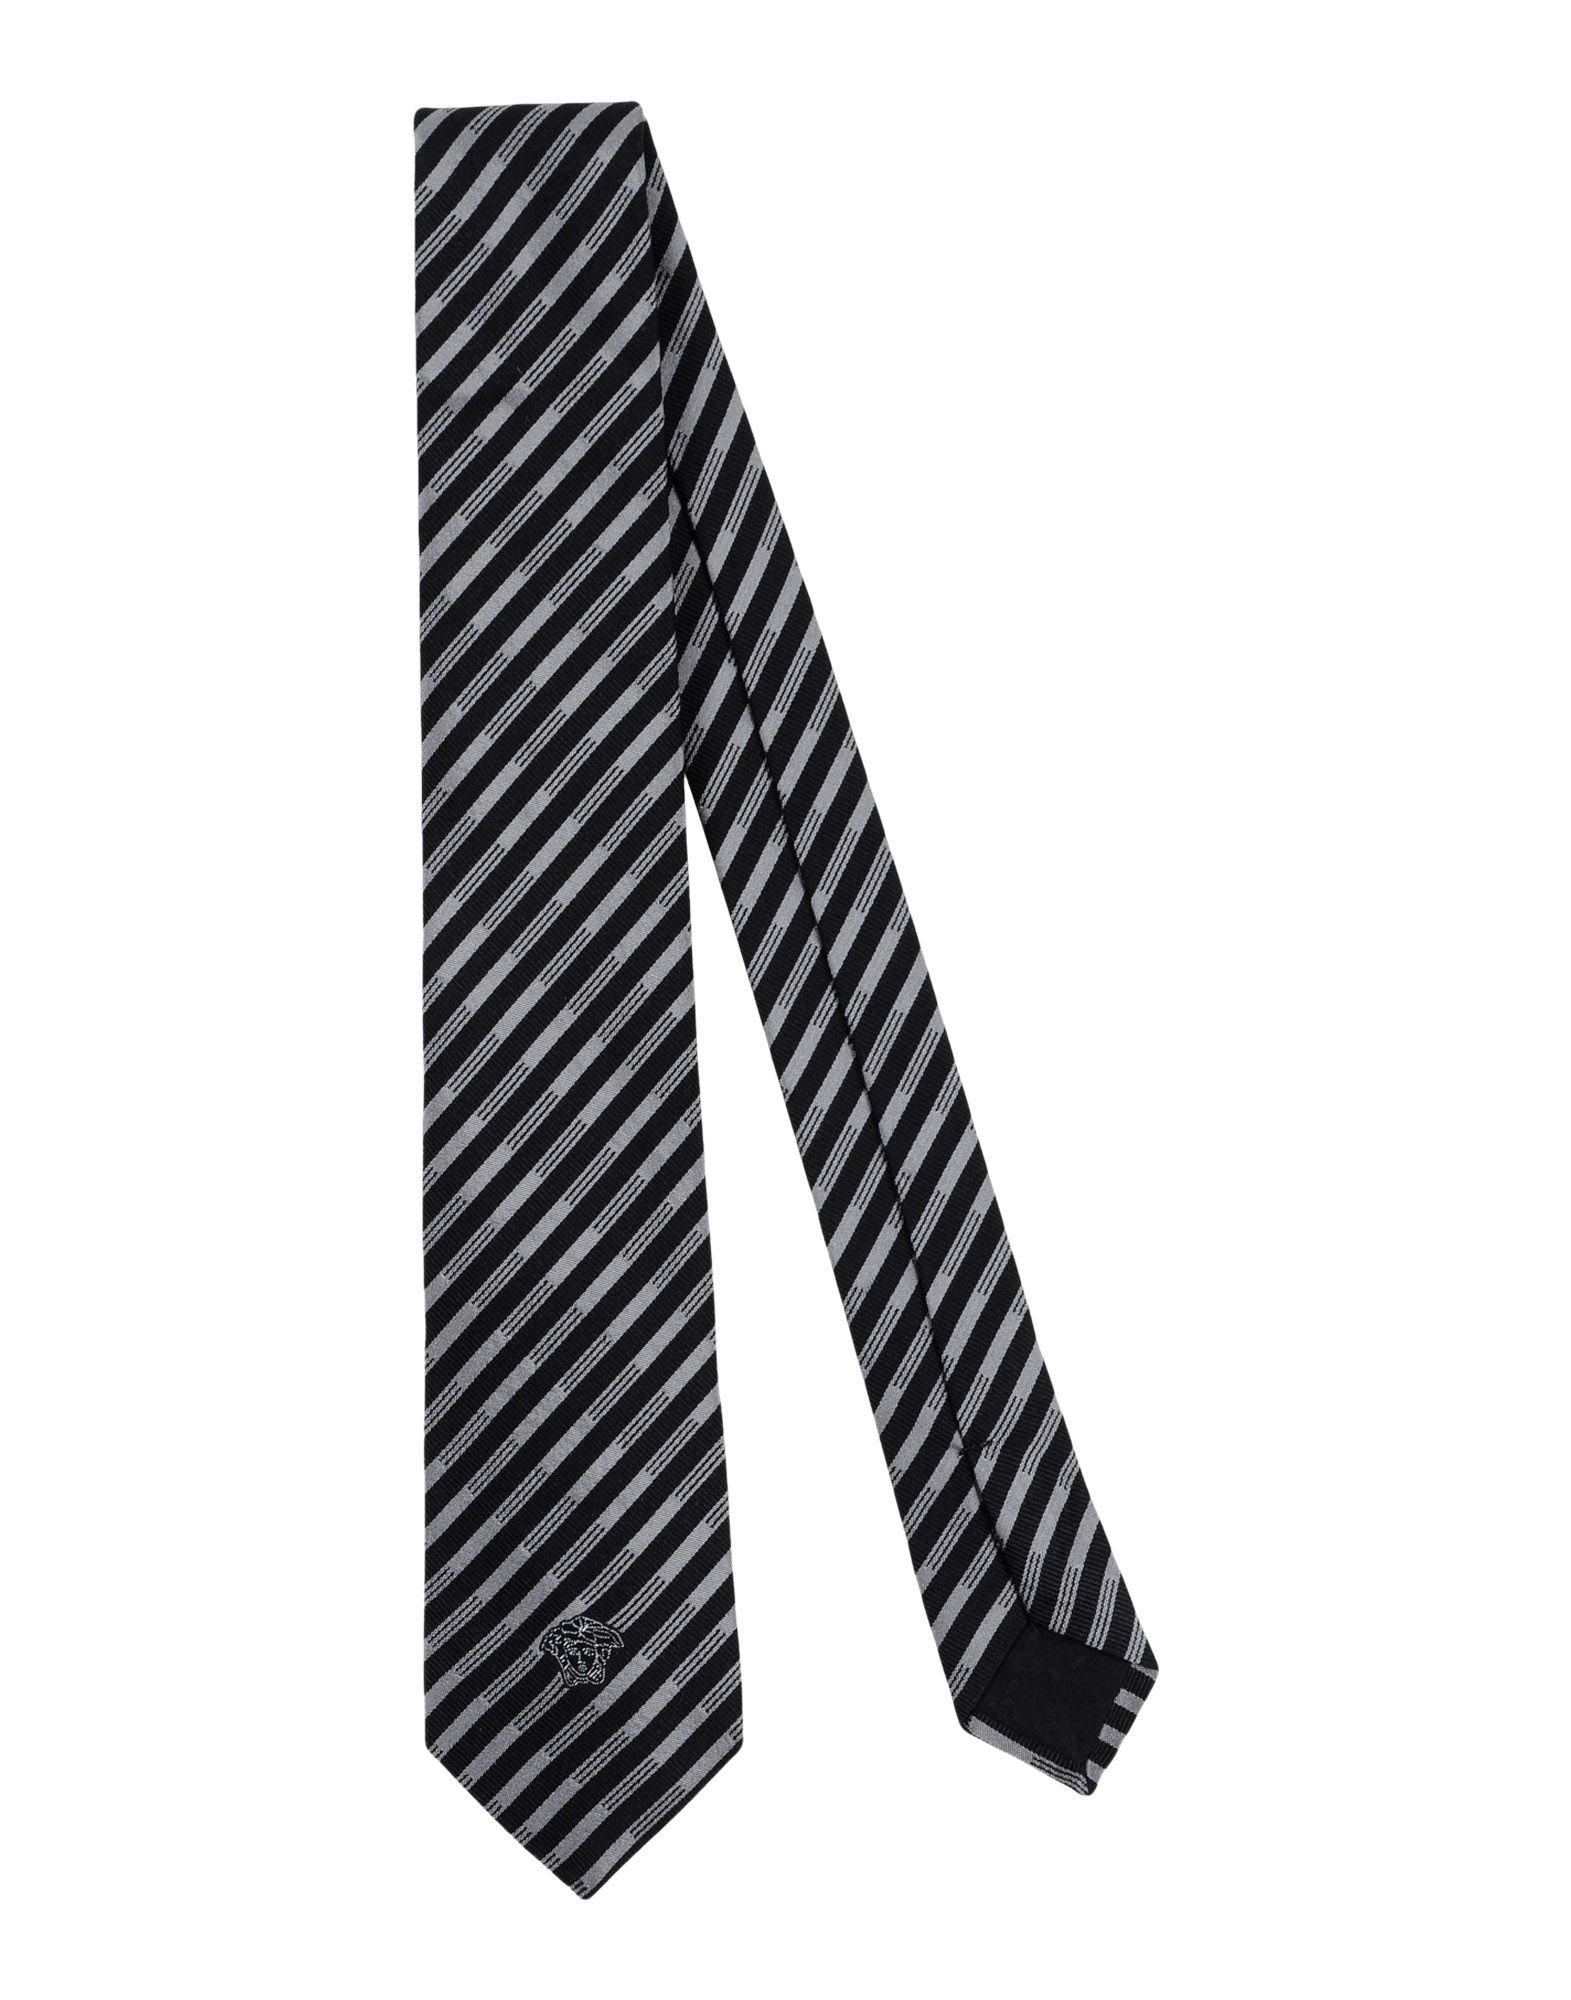 VERSACE Галстук versace бордовый галстук в клетку внизу с логотипом versace 821752 page 5